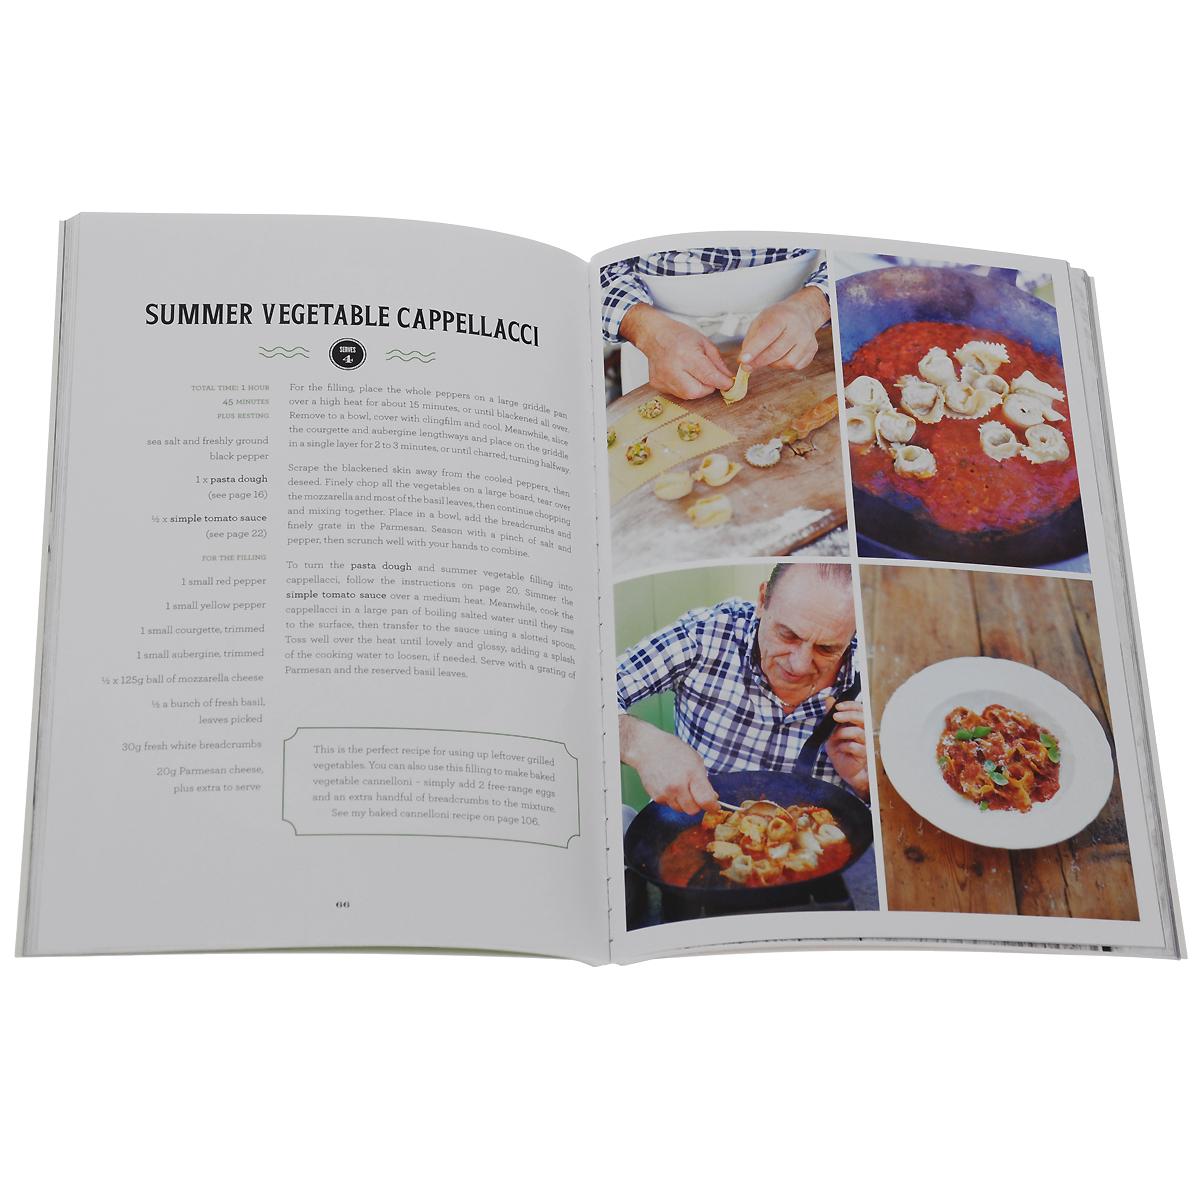 Jamie's Food Tube: The Pasta Book: 50 Easy, Delicious, Seasonal Pasta Recipes